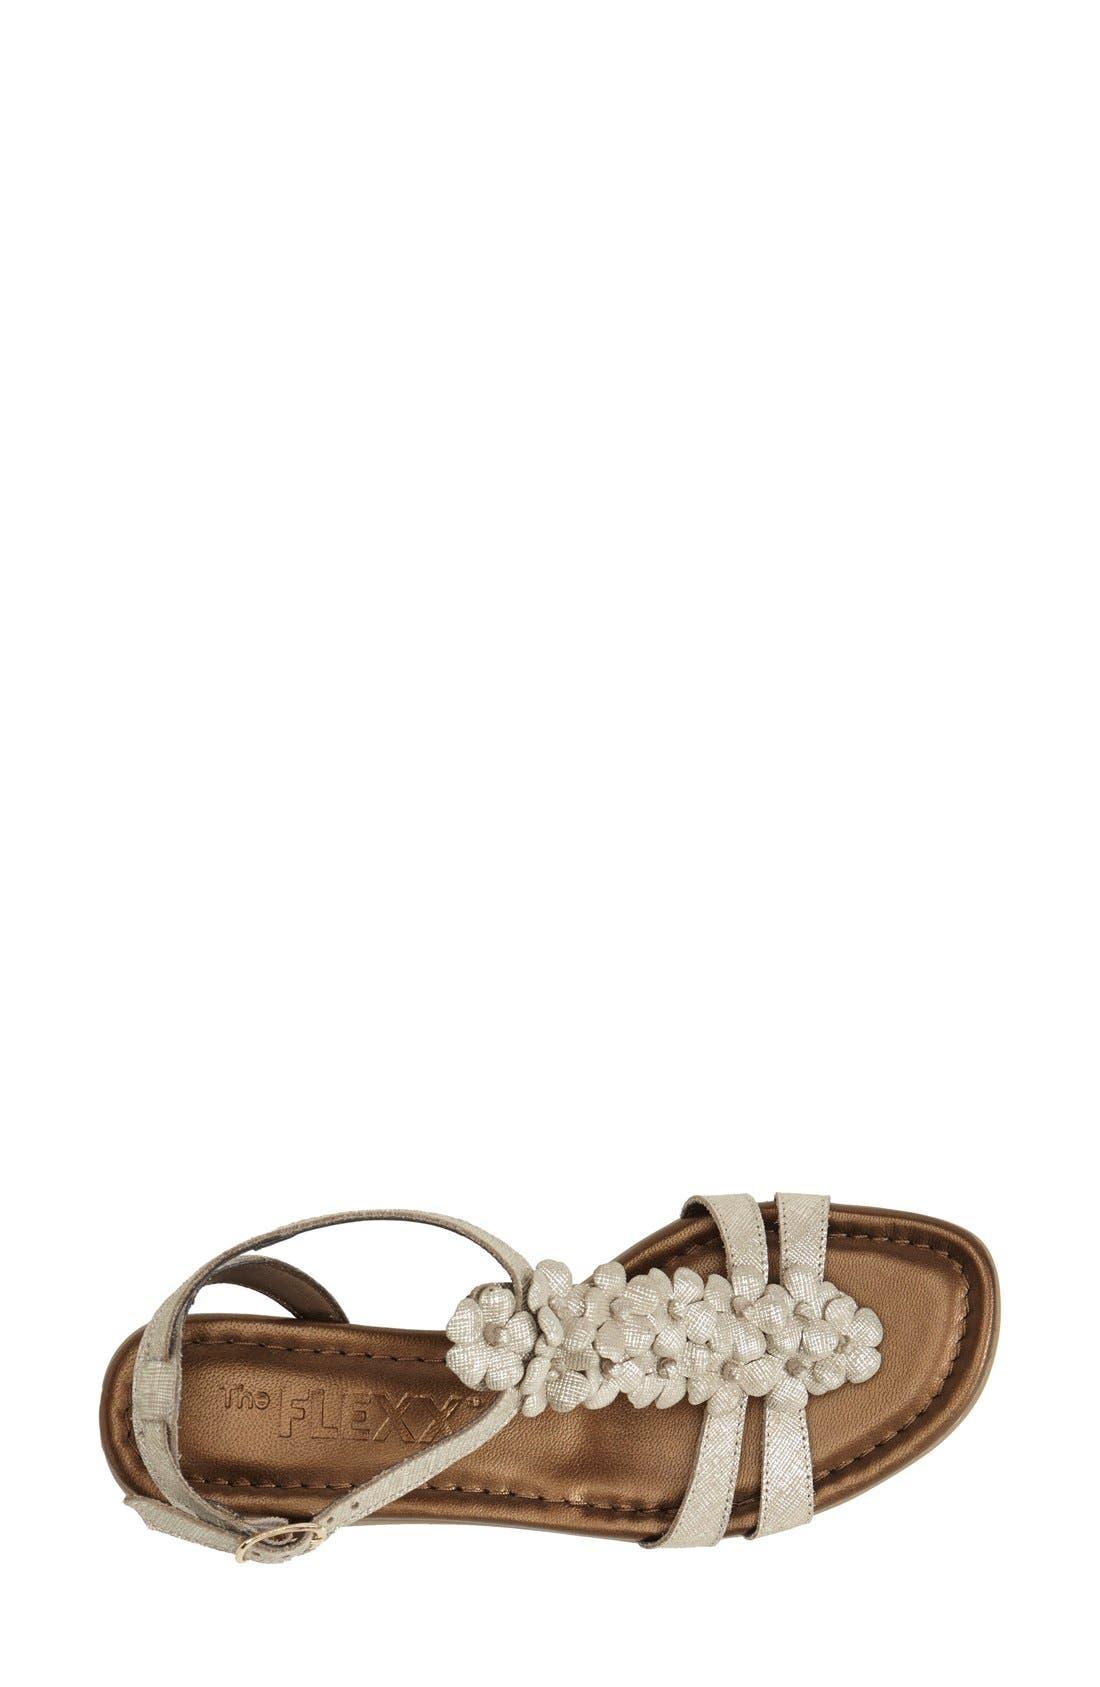 Alternate Image 3  - The FLEXX 'Gladiola' Leather Sandal (Women)